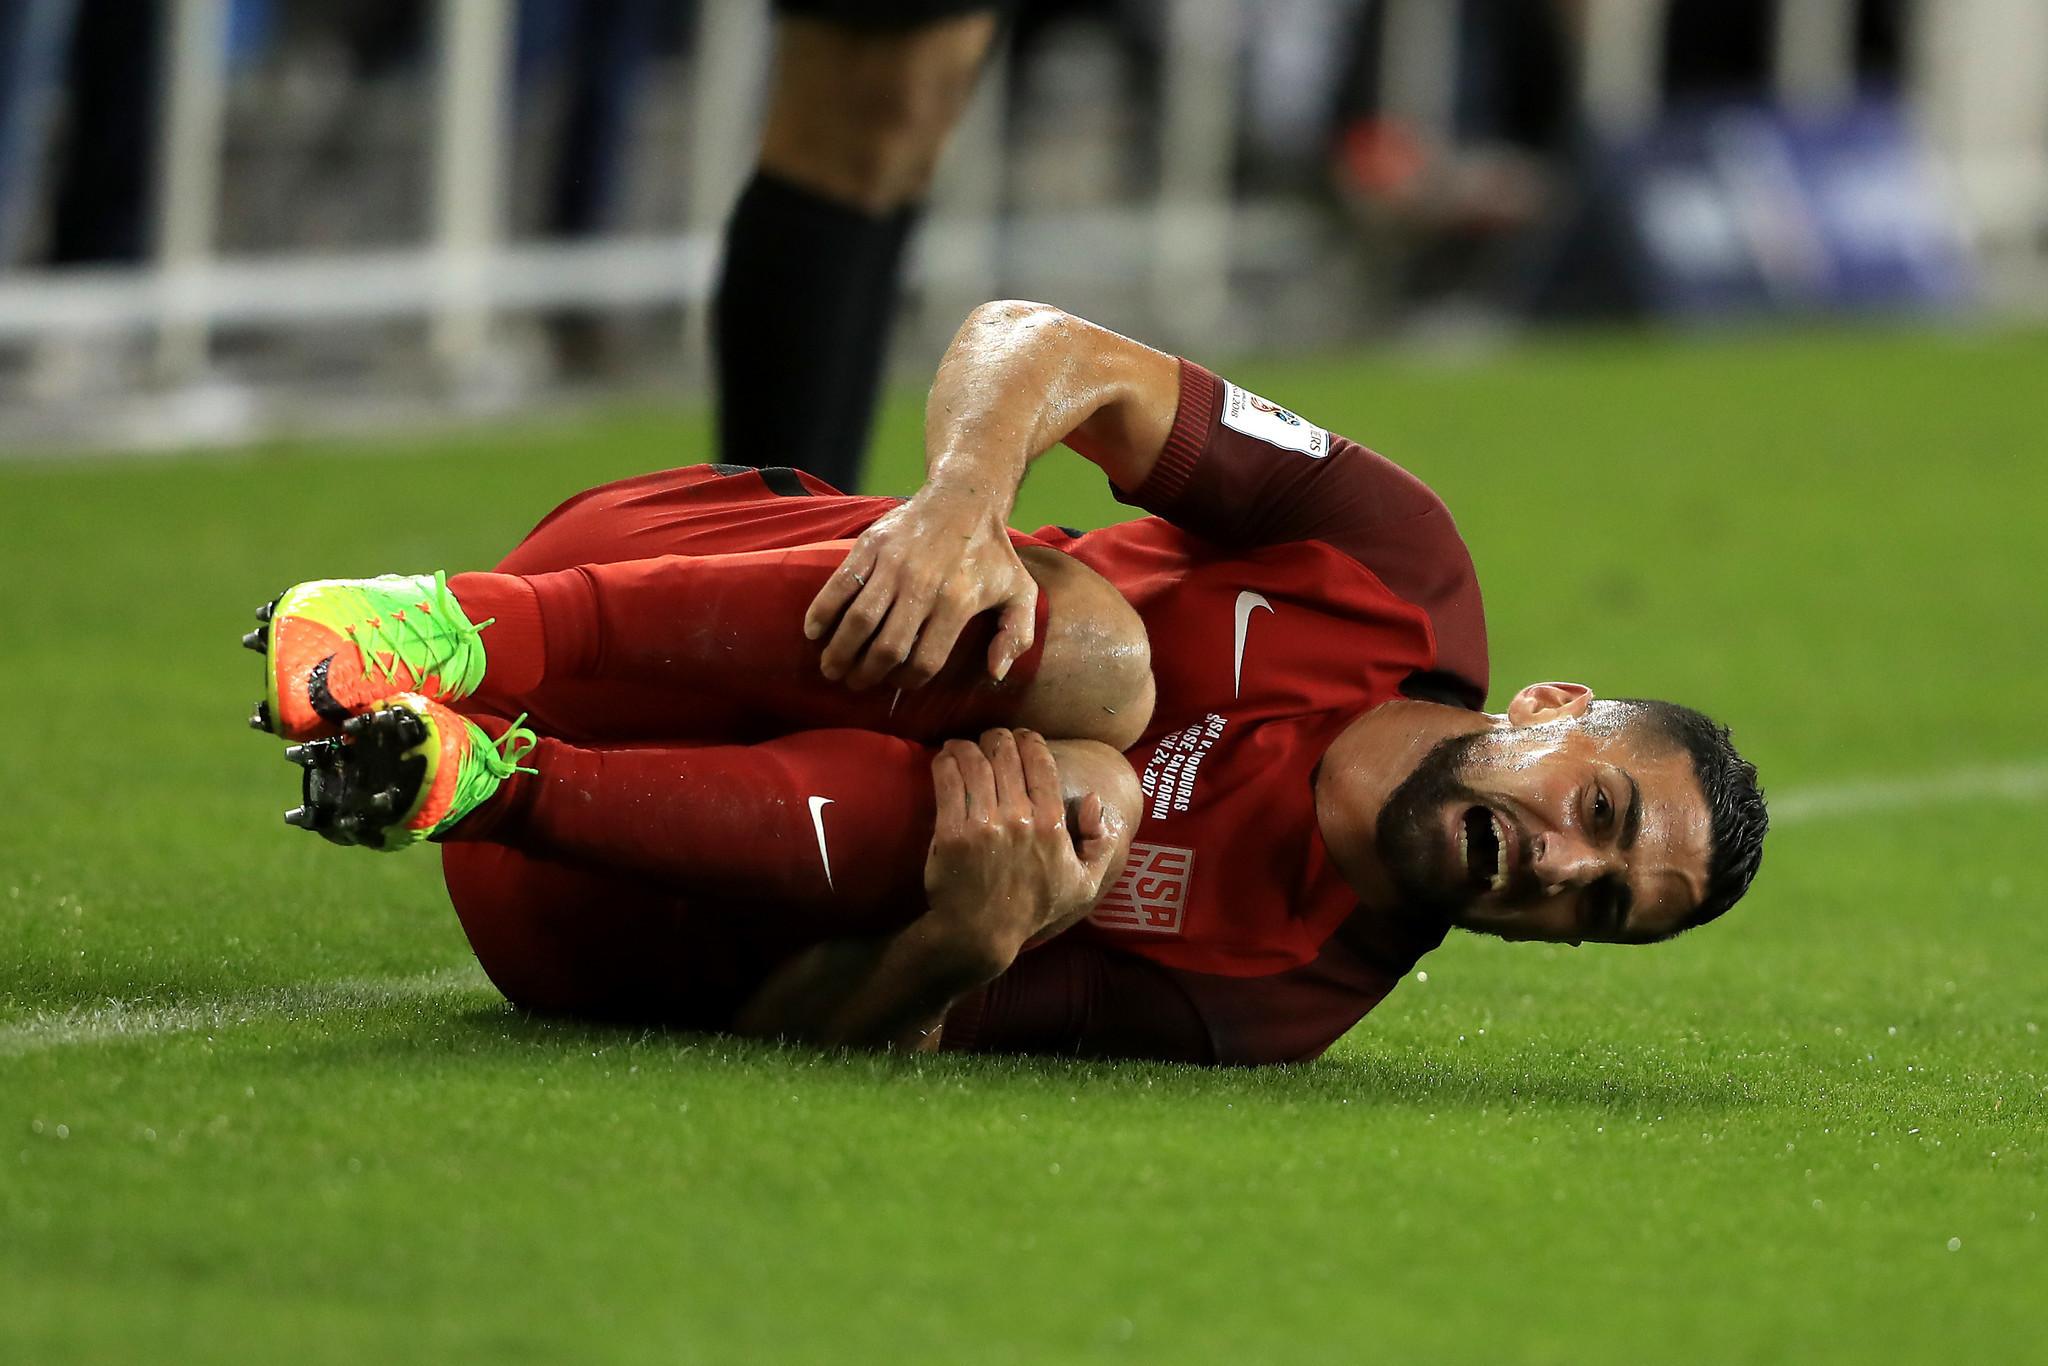 Injuries continue to hamstring, hobble and hinder Galaxy this season